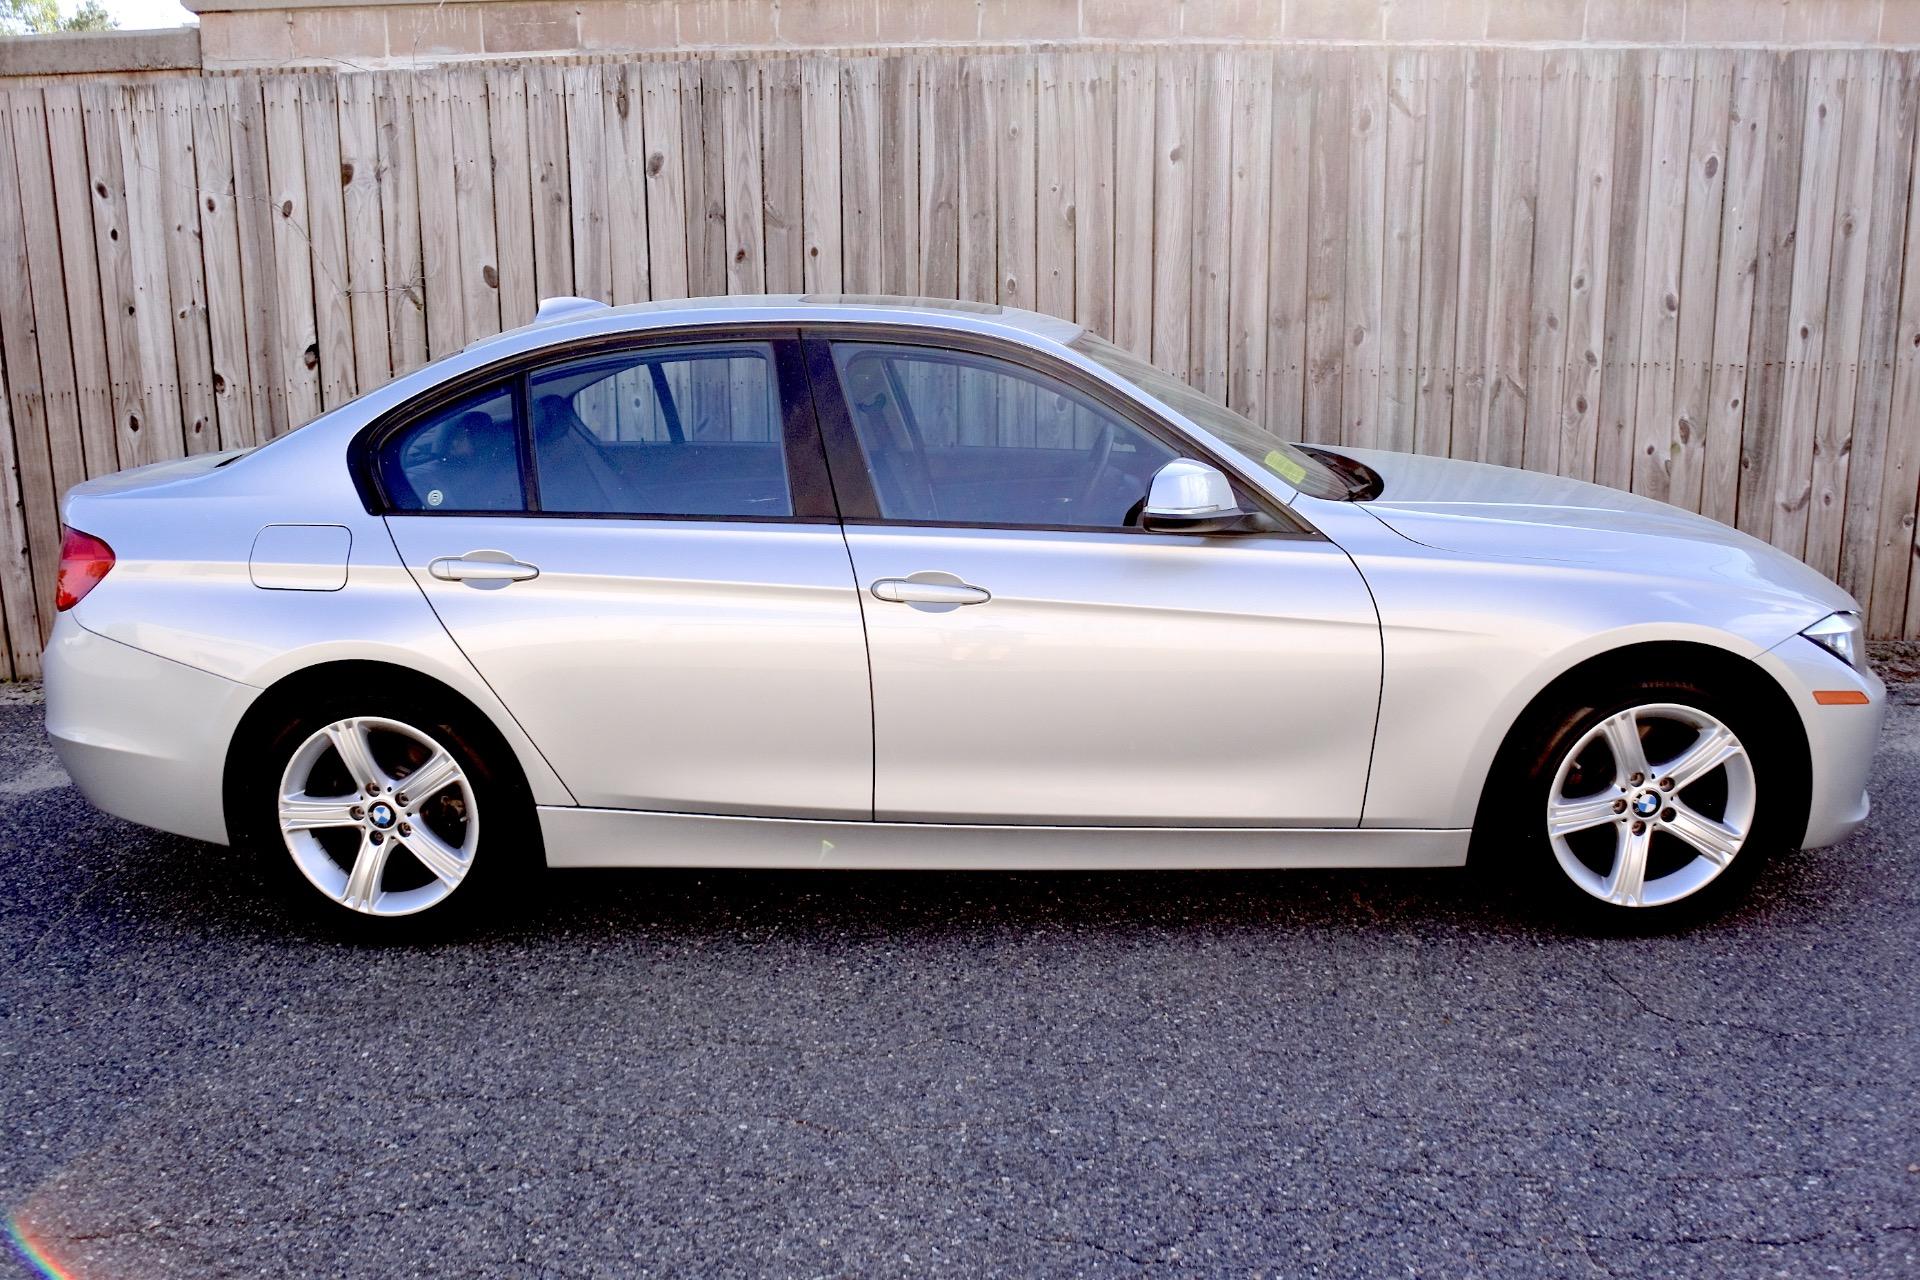 Used 2013 BMW 3 Series 4dr Sdn 328i xDrive AWD SULEV Used 2013 BMW 3 Series 4dr Sdn 328i xDrive AWD SULEV for sale  at Metro West Motorcars LLC in Shrewsbury MA 6